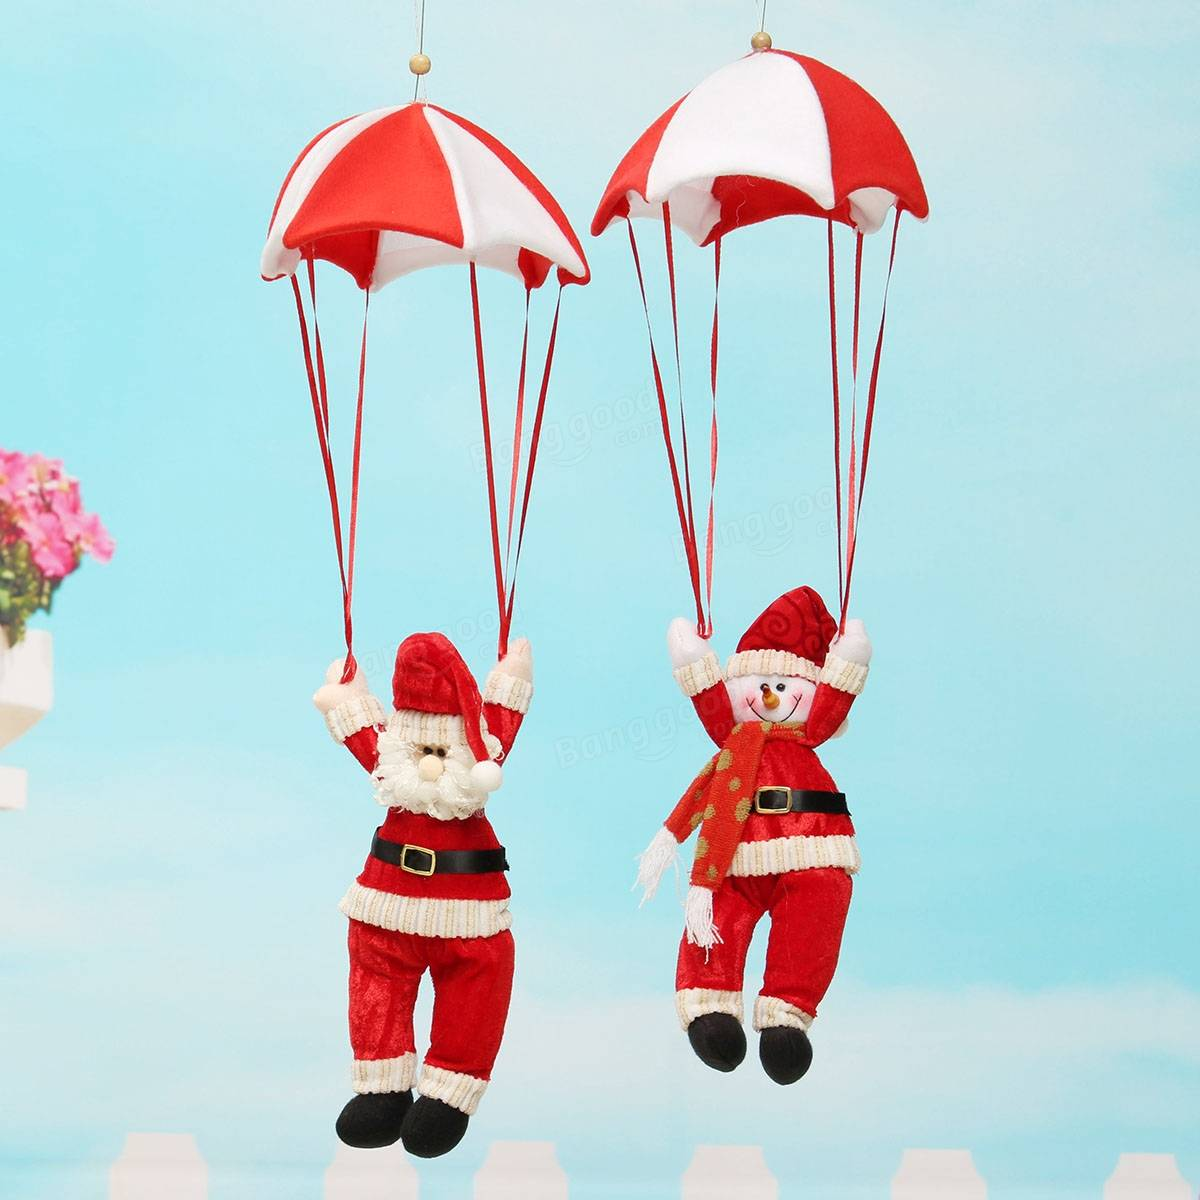 Santa claus snowman in parachute christmas tree hanging xmas ornament decoration